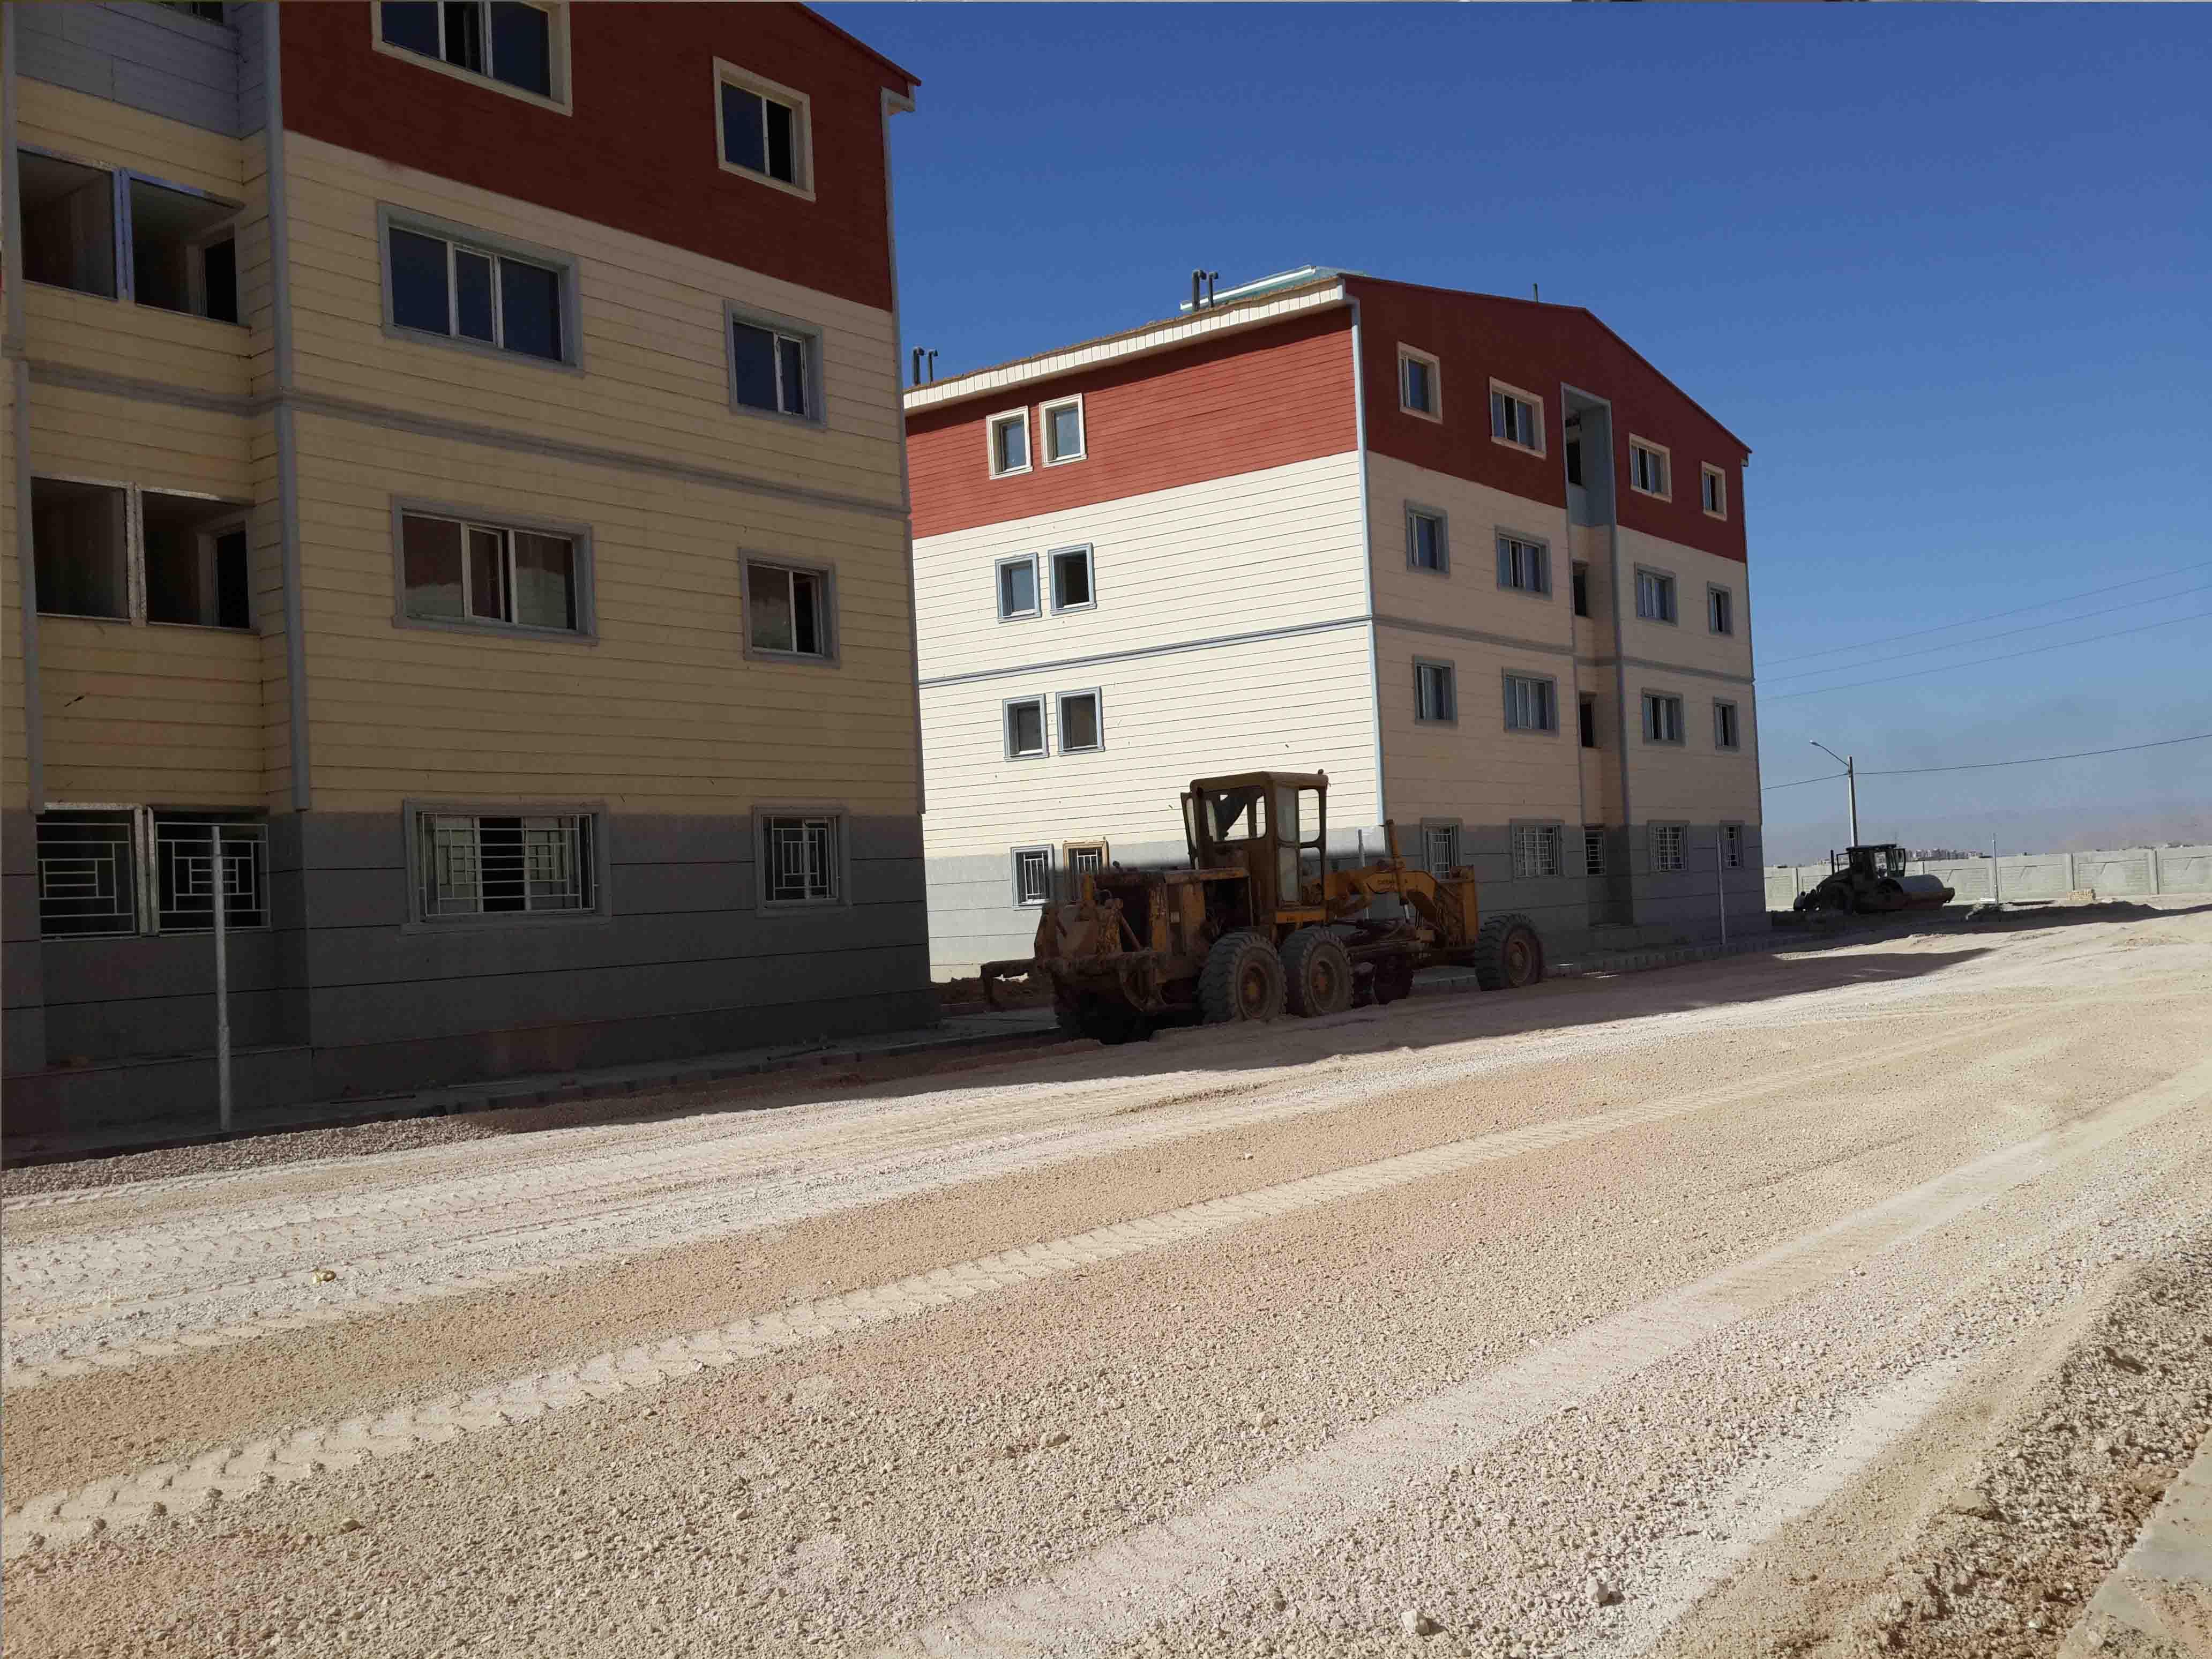 پروژه پاورپوینت ساختمان با مصالح بنایی